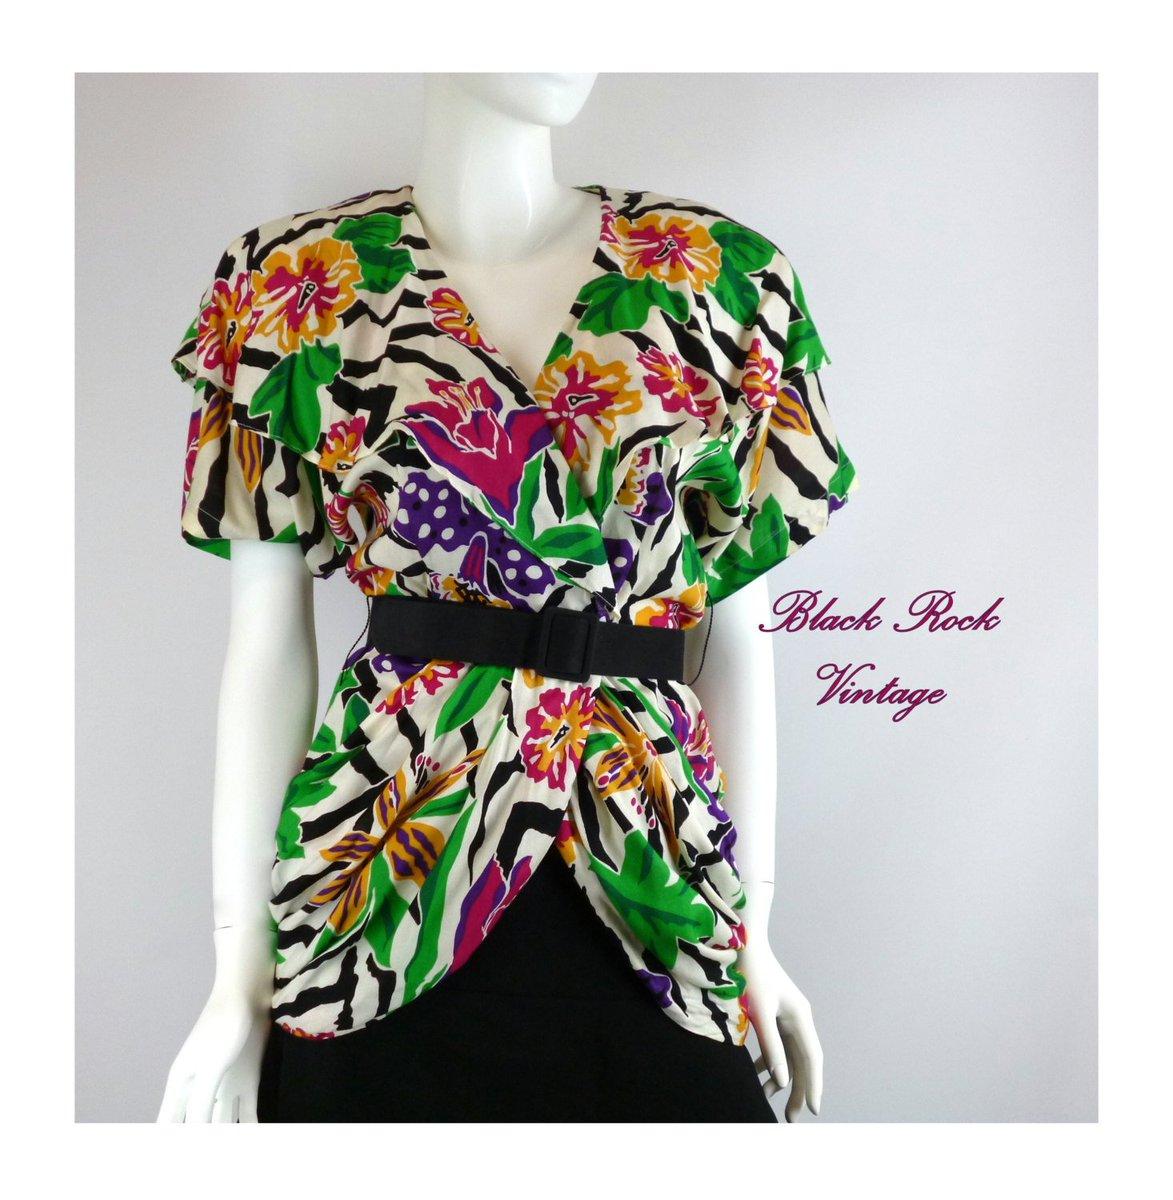 Floral Jacket Tropical Print, Jewel Tones Shawl Collar, Vintage 80… http://etsy.me/2rvVE76 #CheapChic #DrapedBlouse pic.twitter.com/5k74PoYGnn